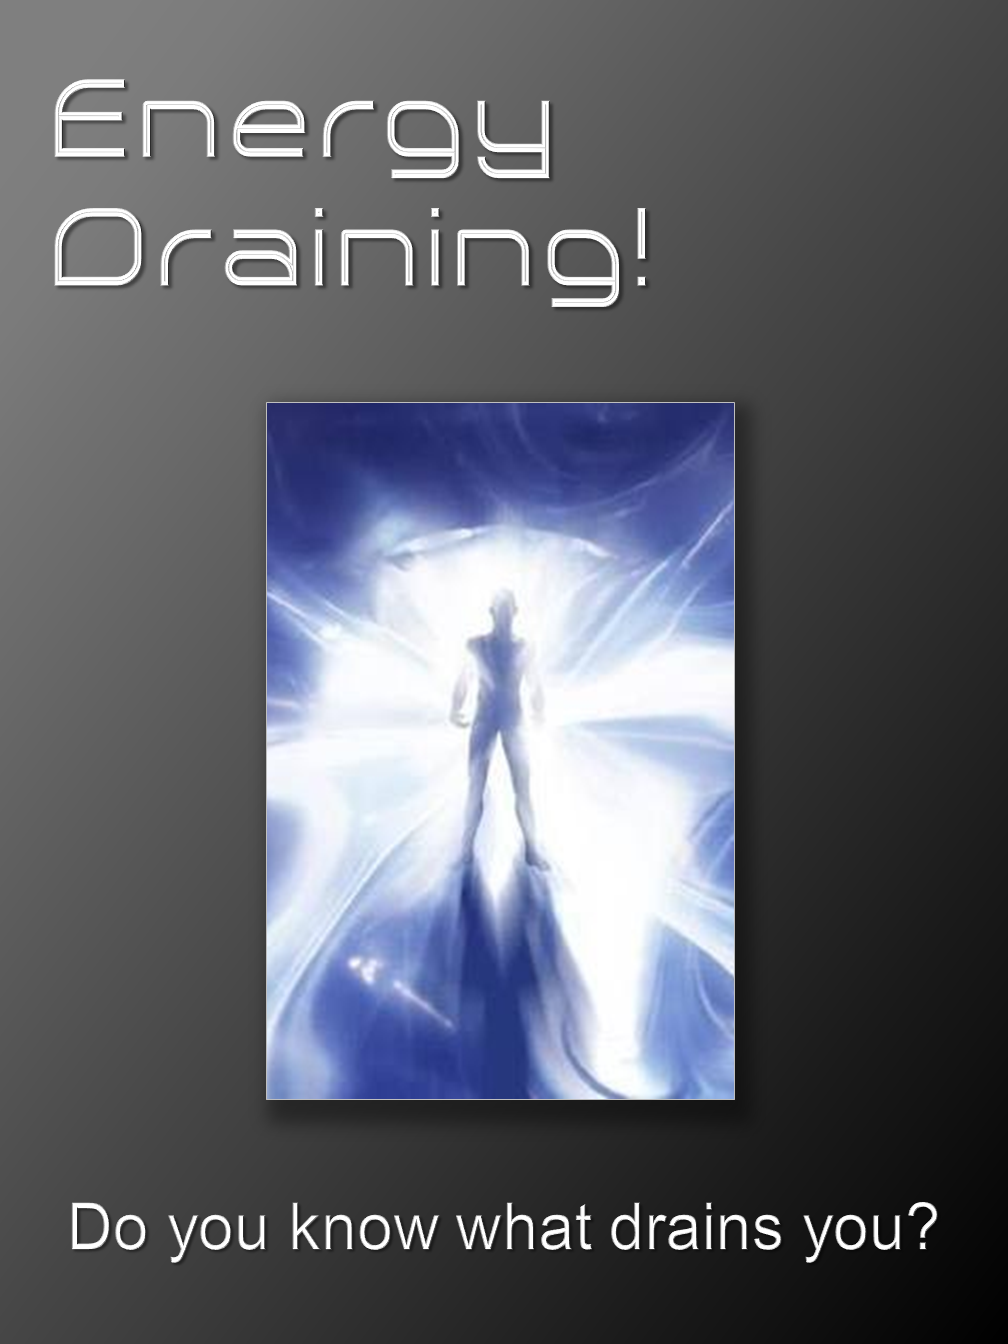 Energy Draining!